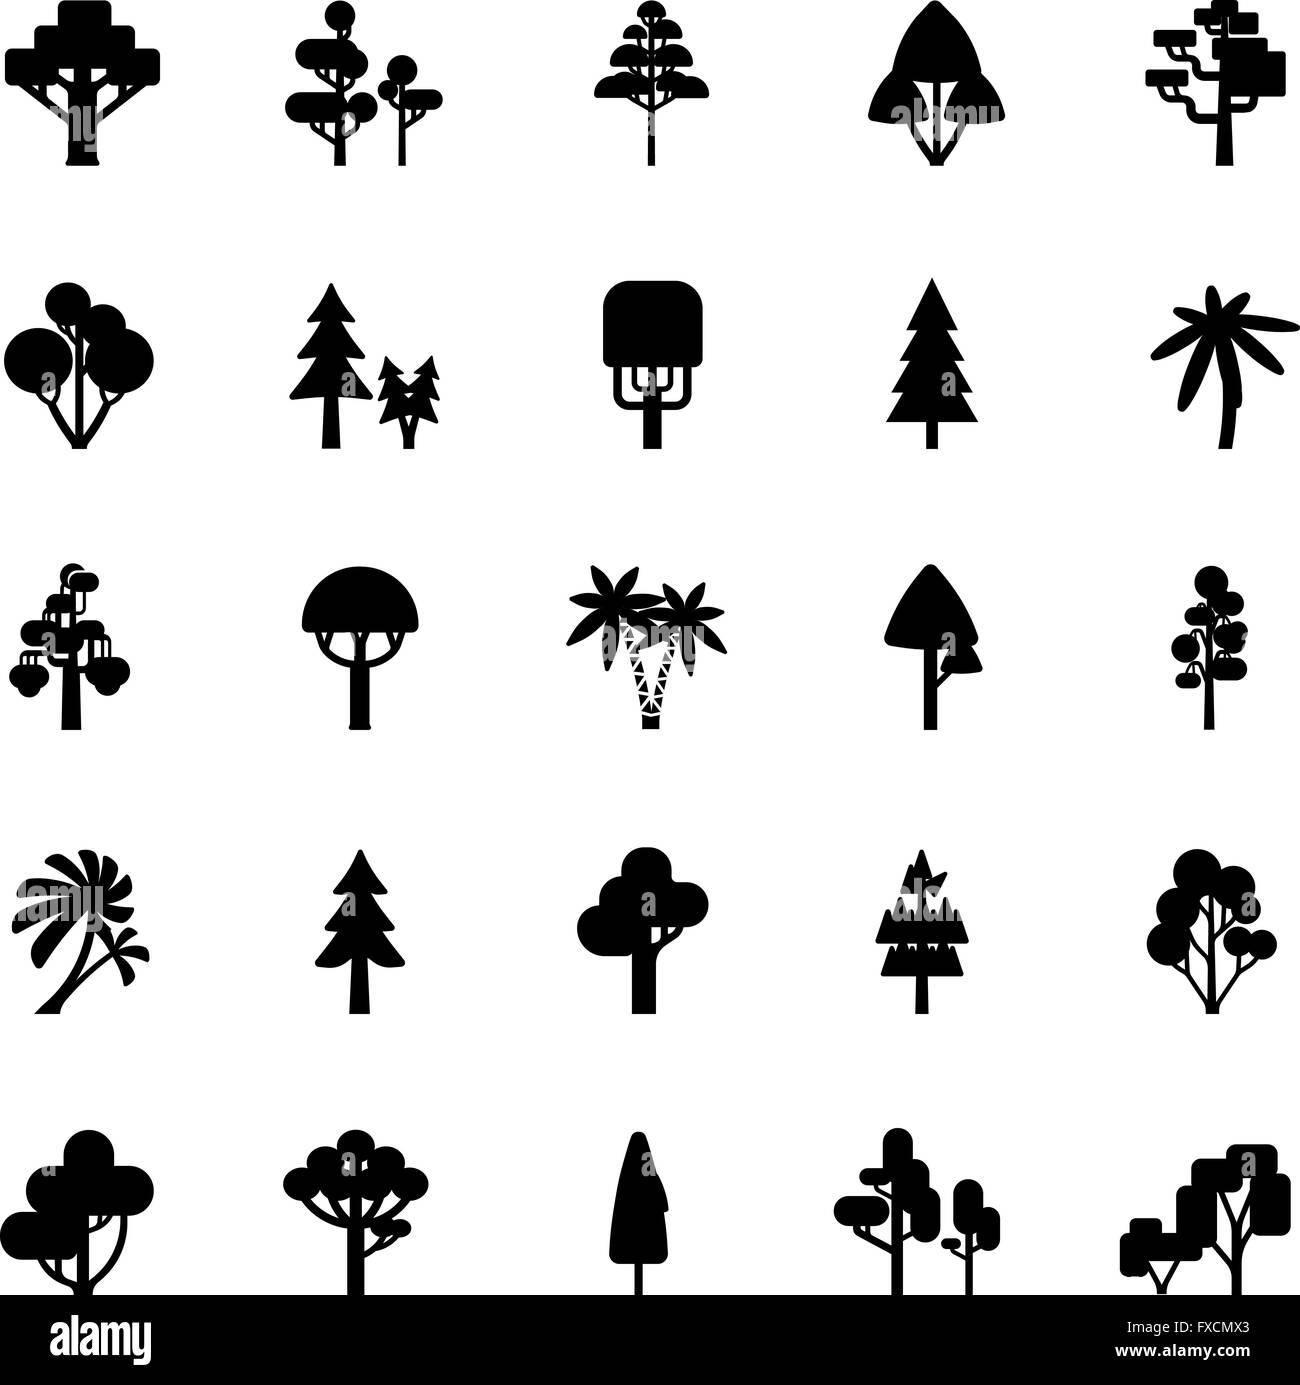 Tree Set Black And White - Stock Image